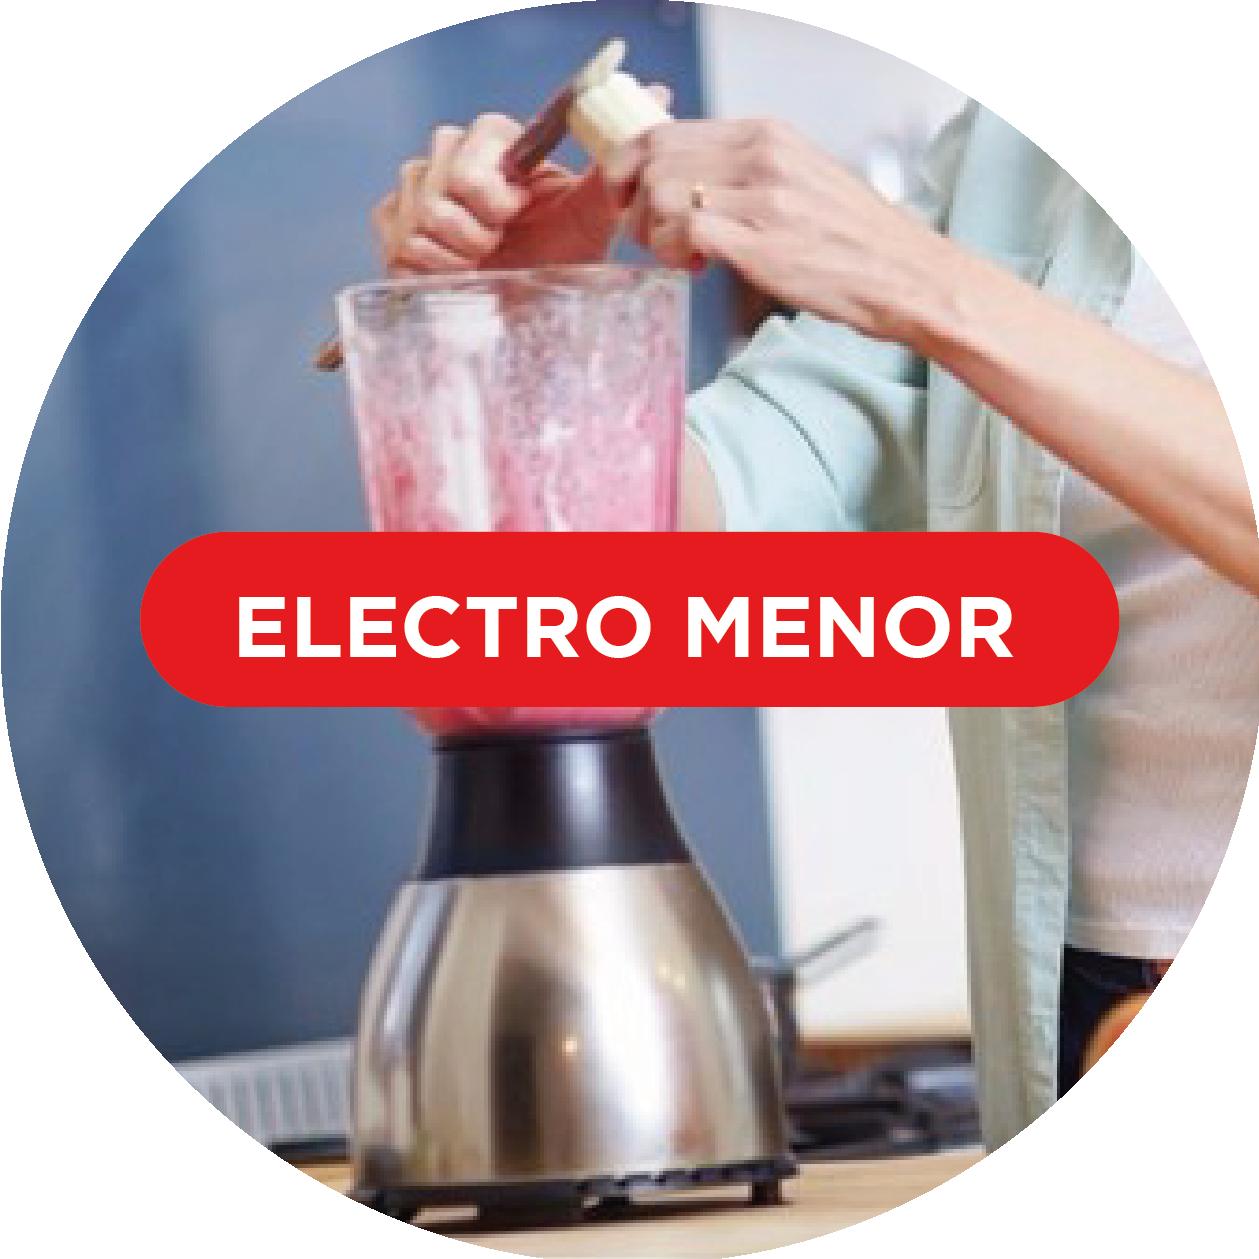 Electro menor | Dismac